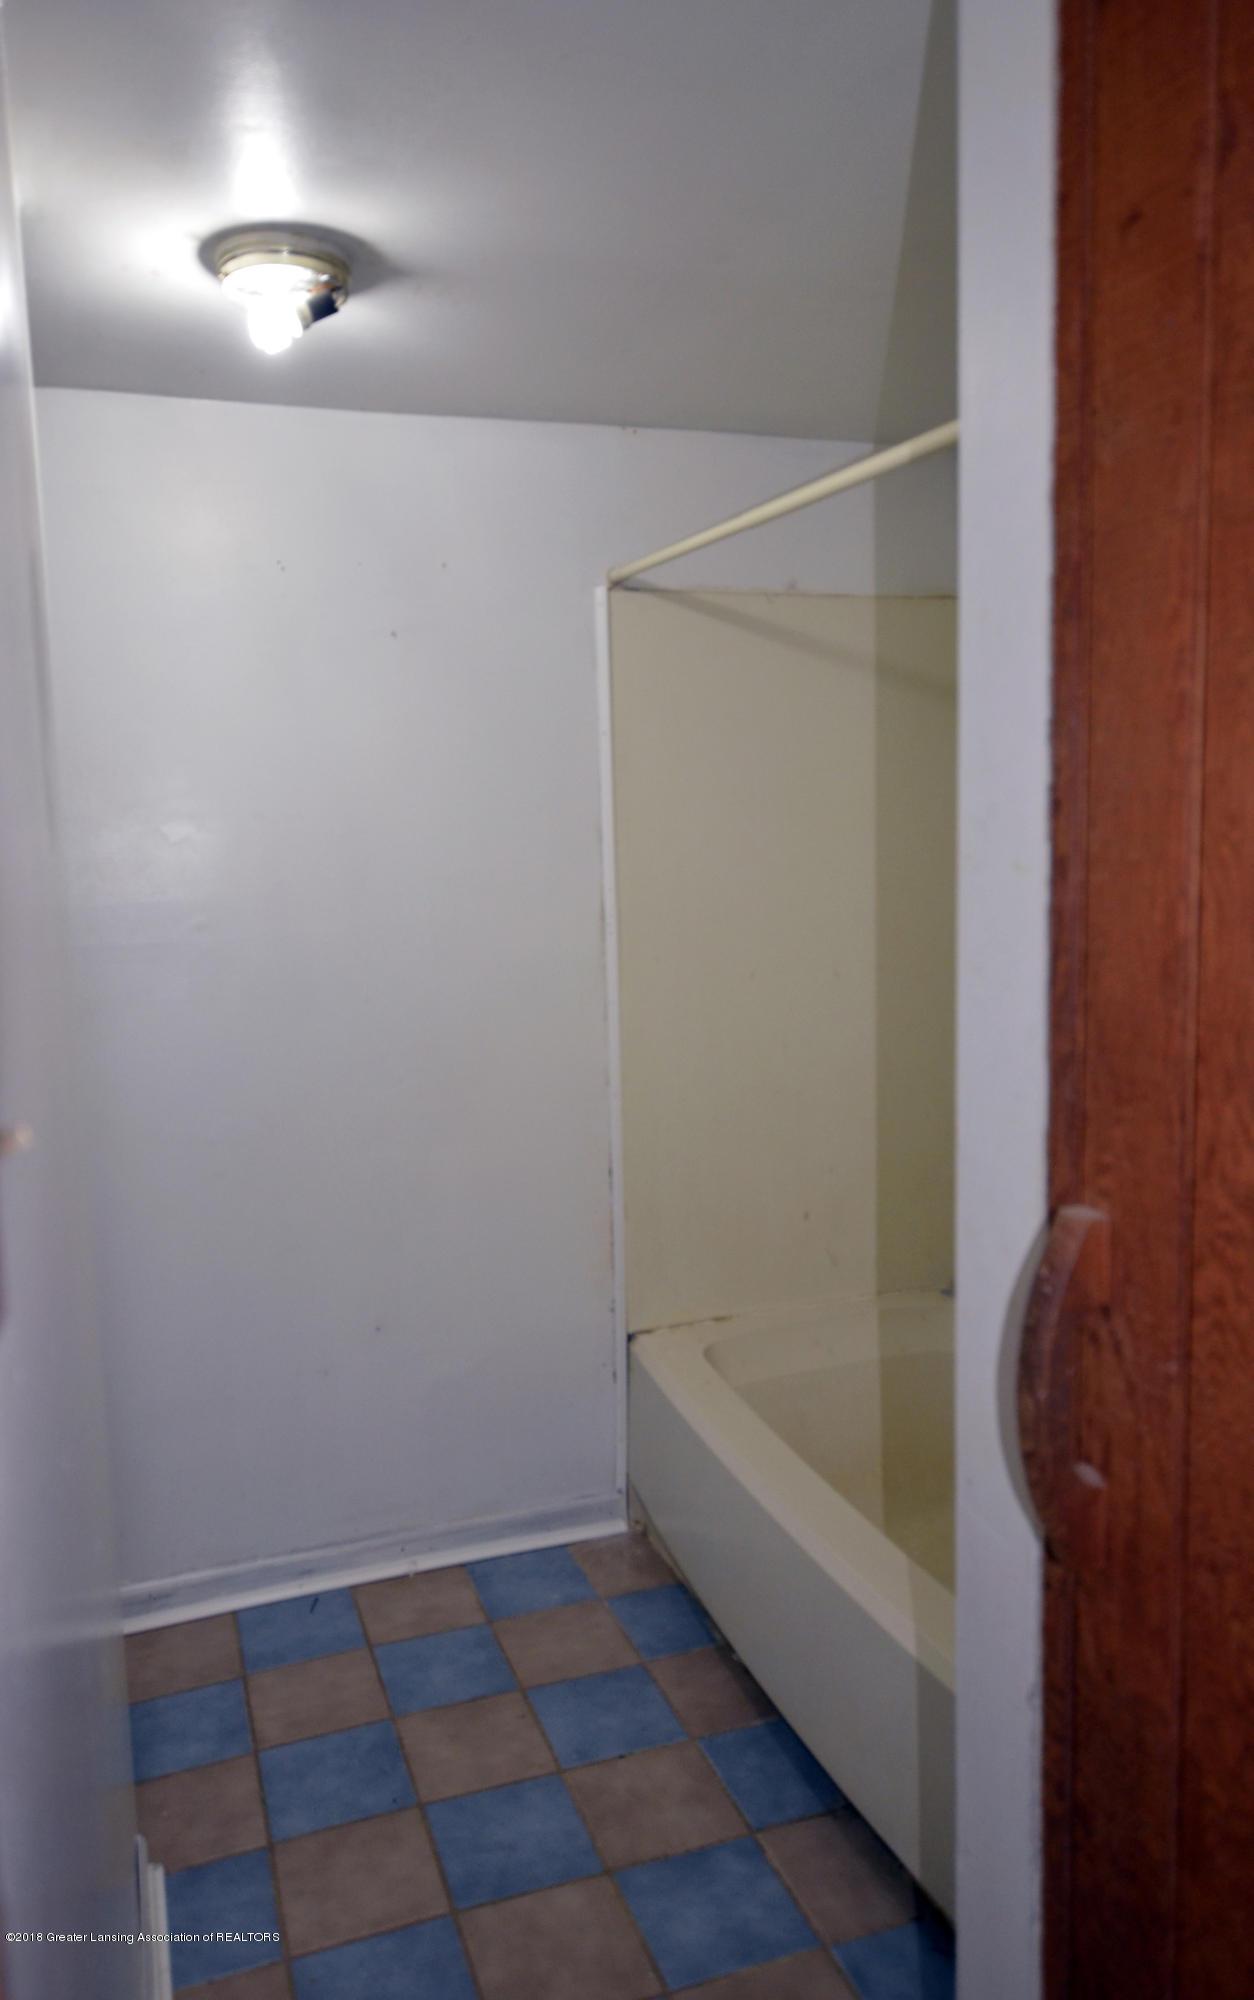 15871 Short St - 15871 Short St bathroom - 7